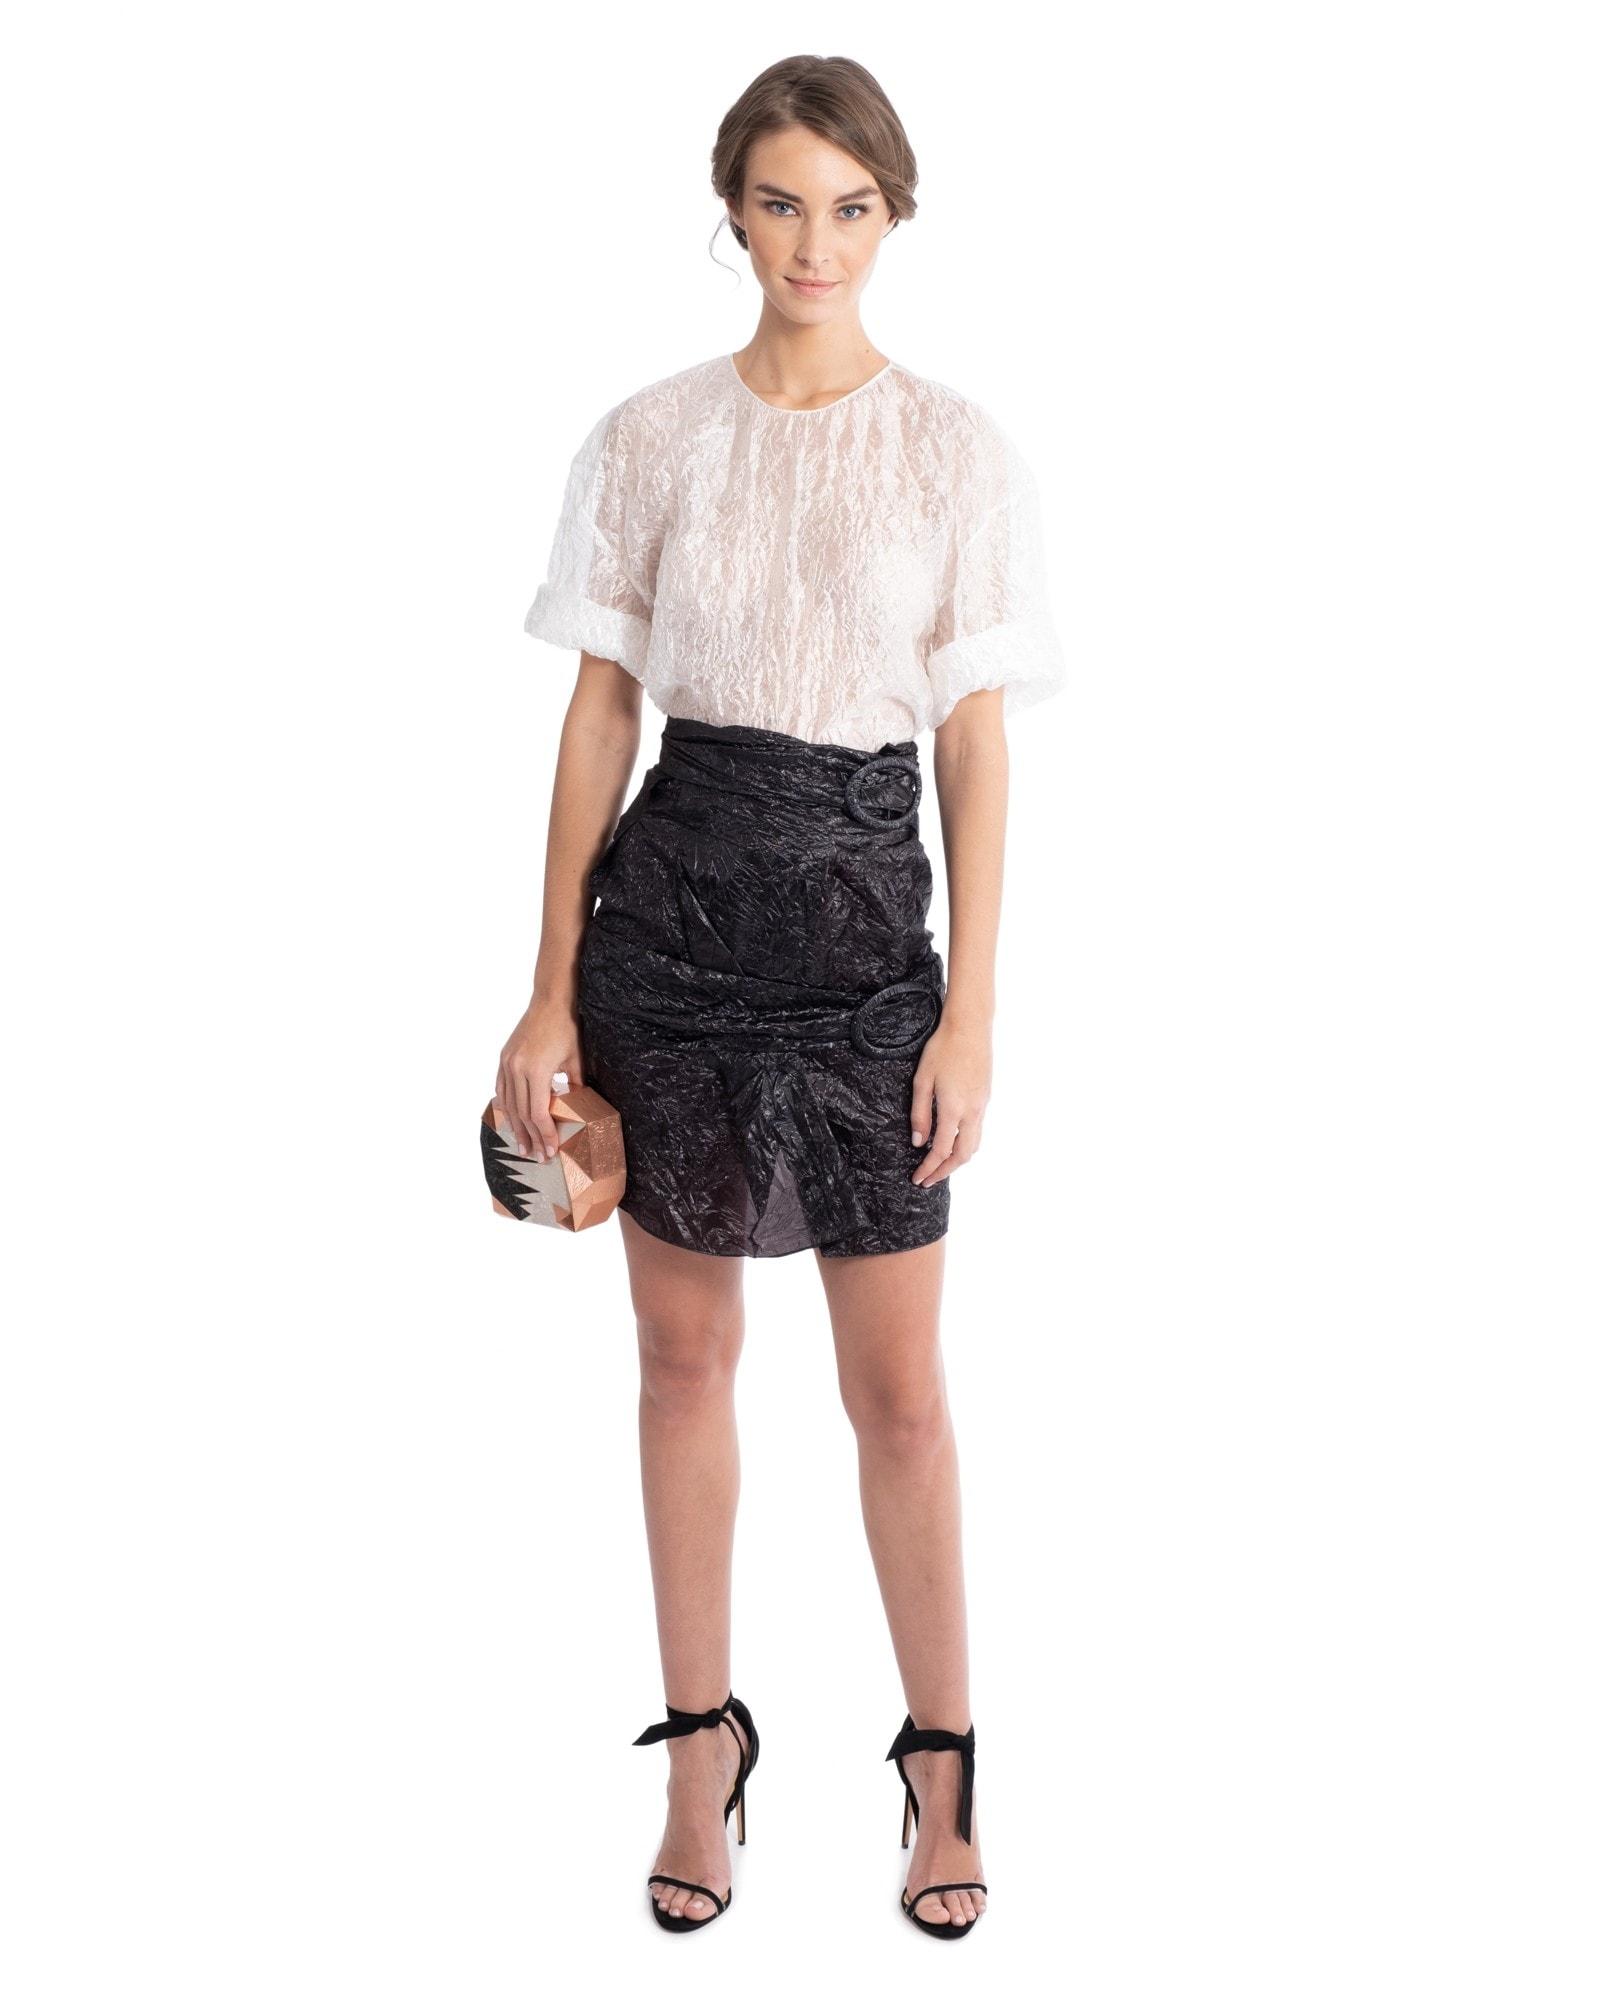 Parachute Silk Top and Skirt